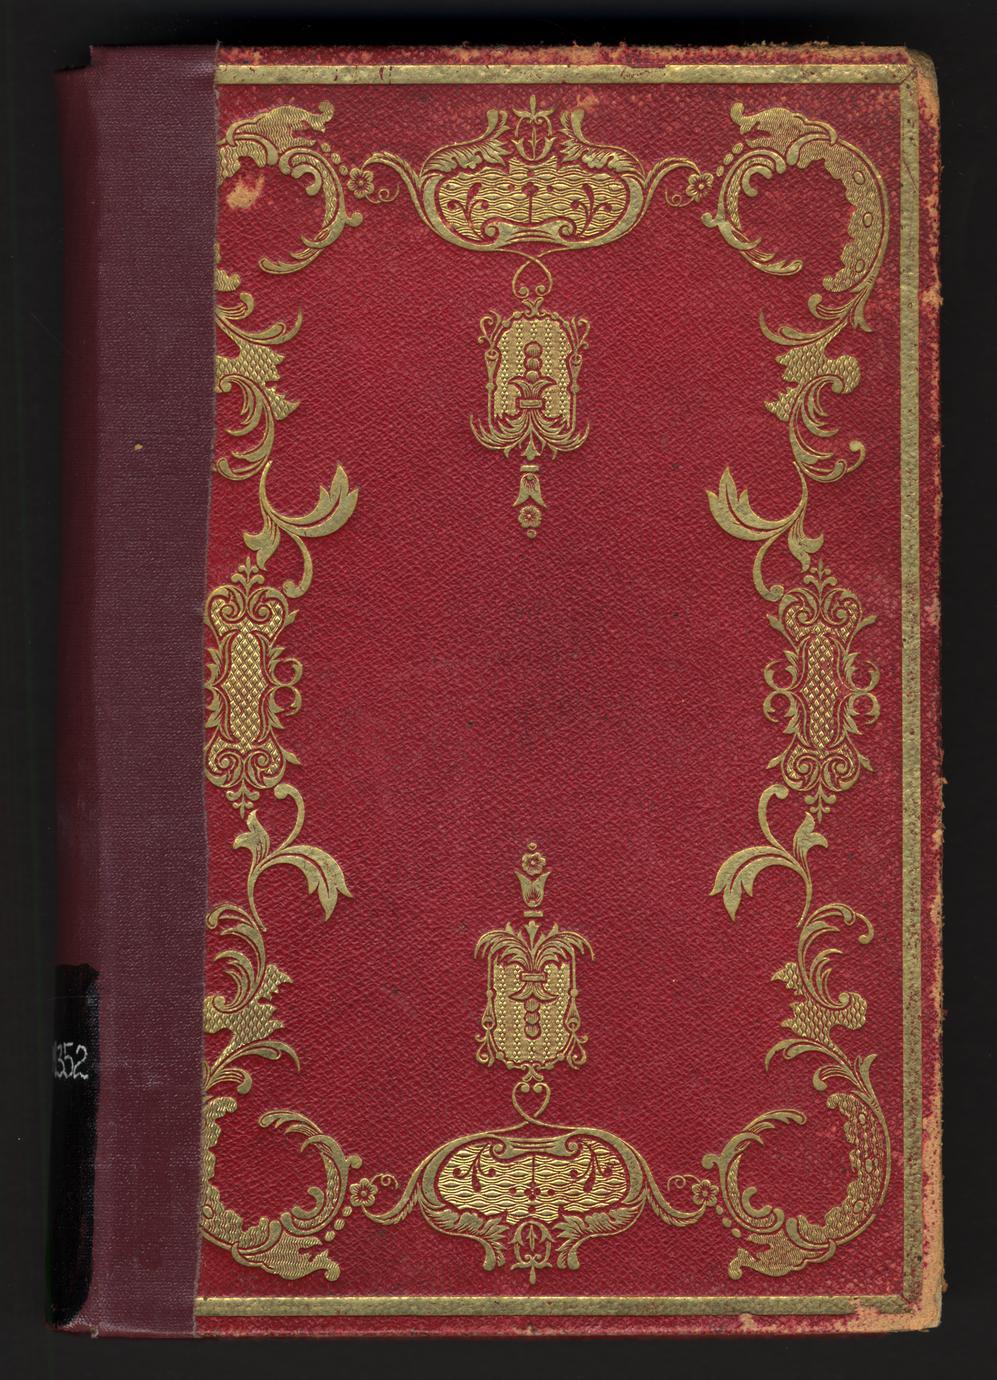 The American keepsake, for 1851